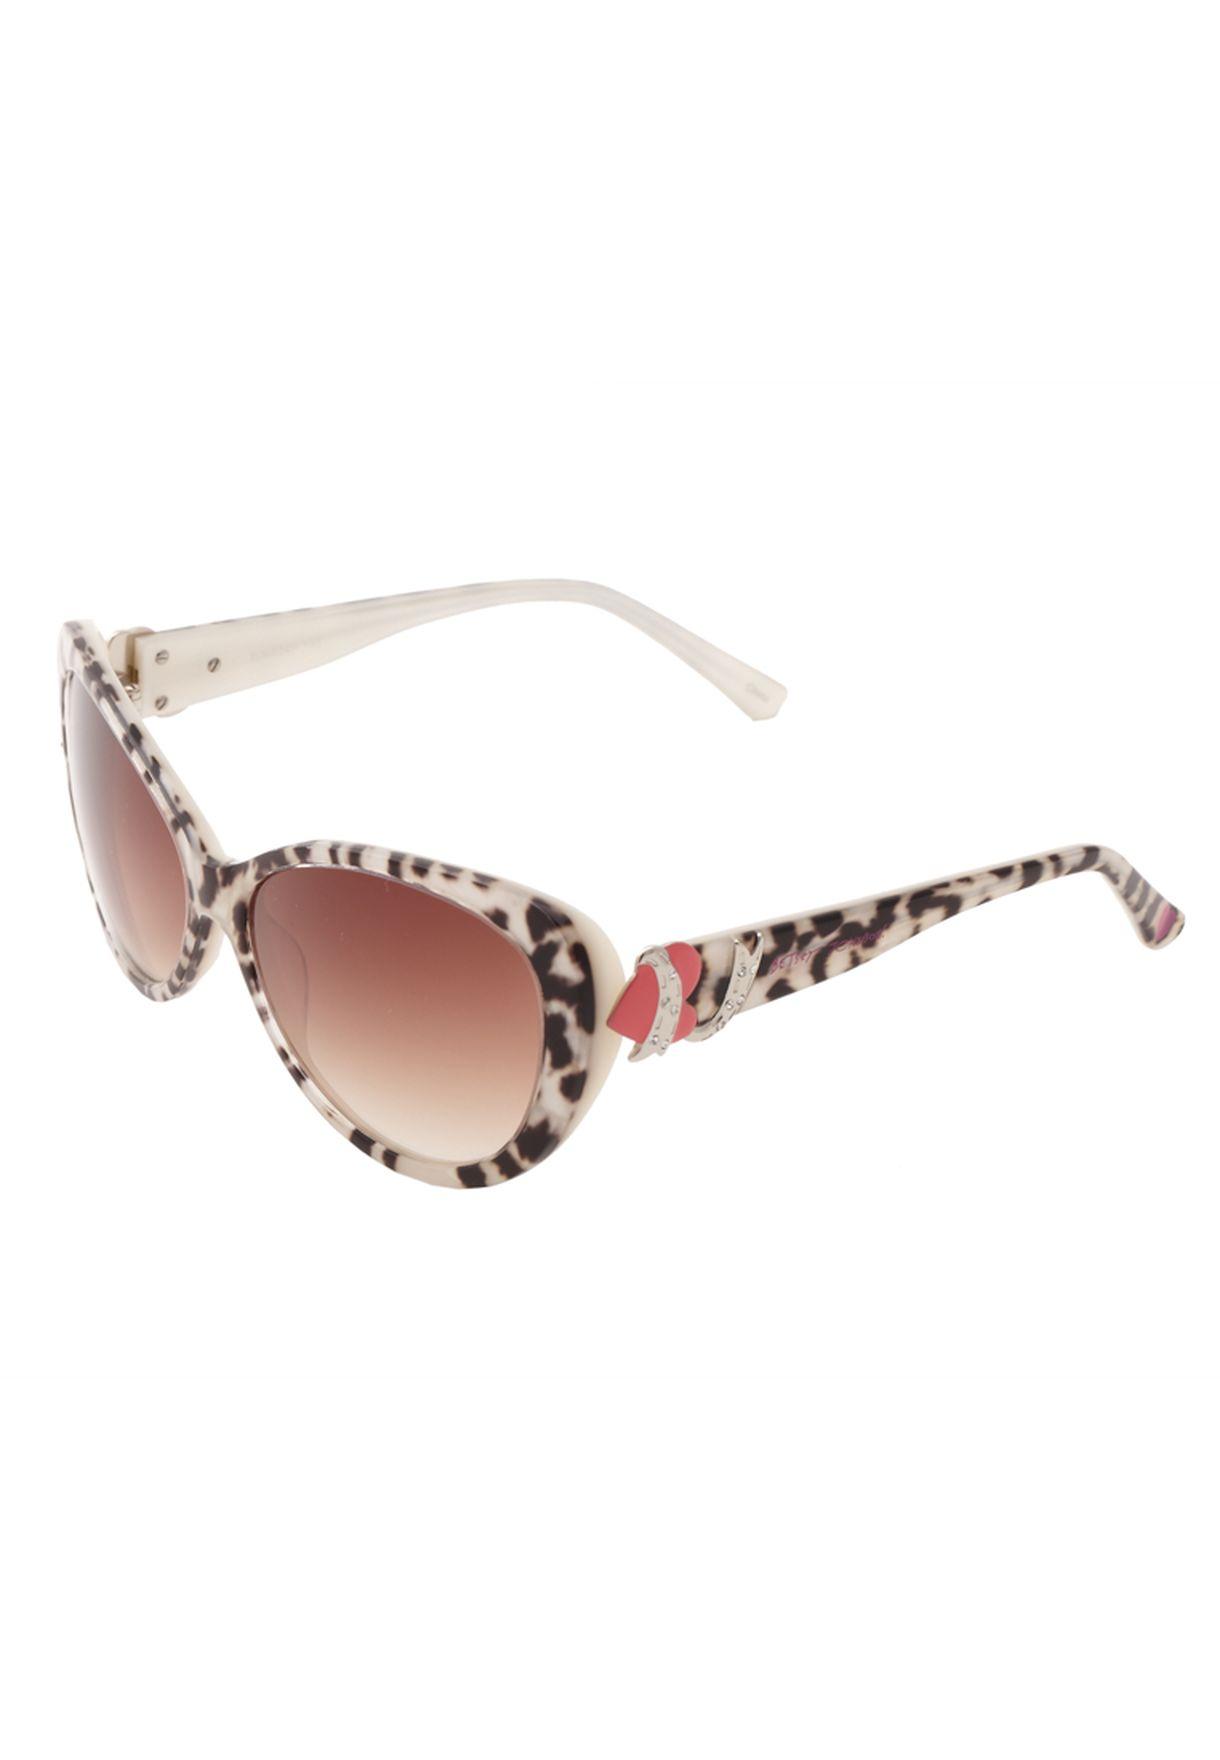 12e6b9d3f541 Shop Betsey Johnson animalprint Trendy Sunglasses for Women in ...